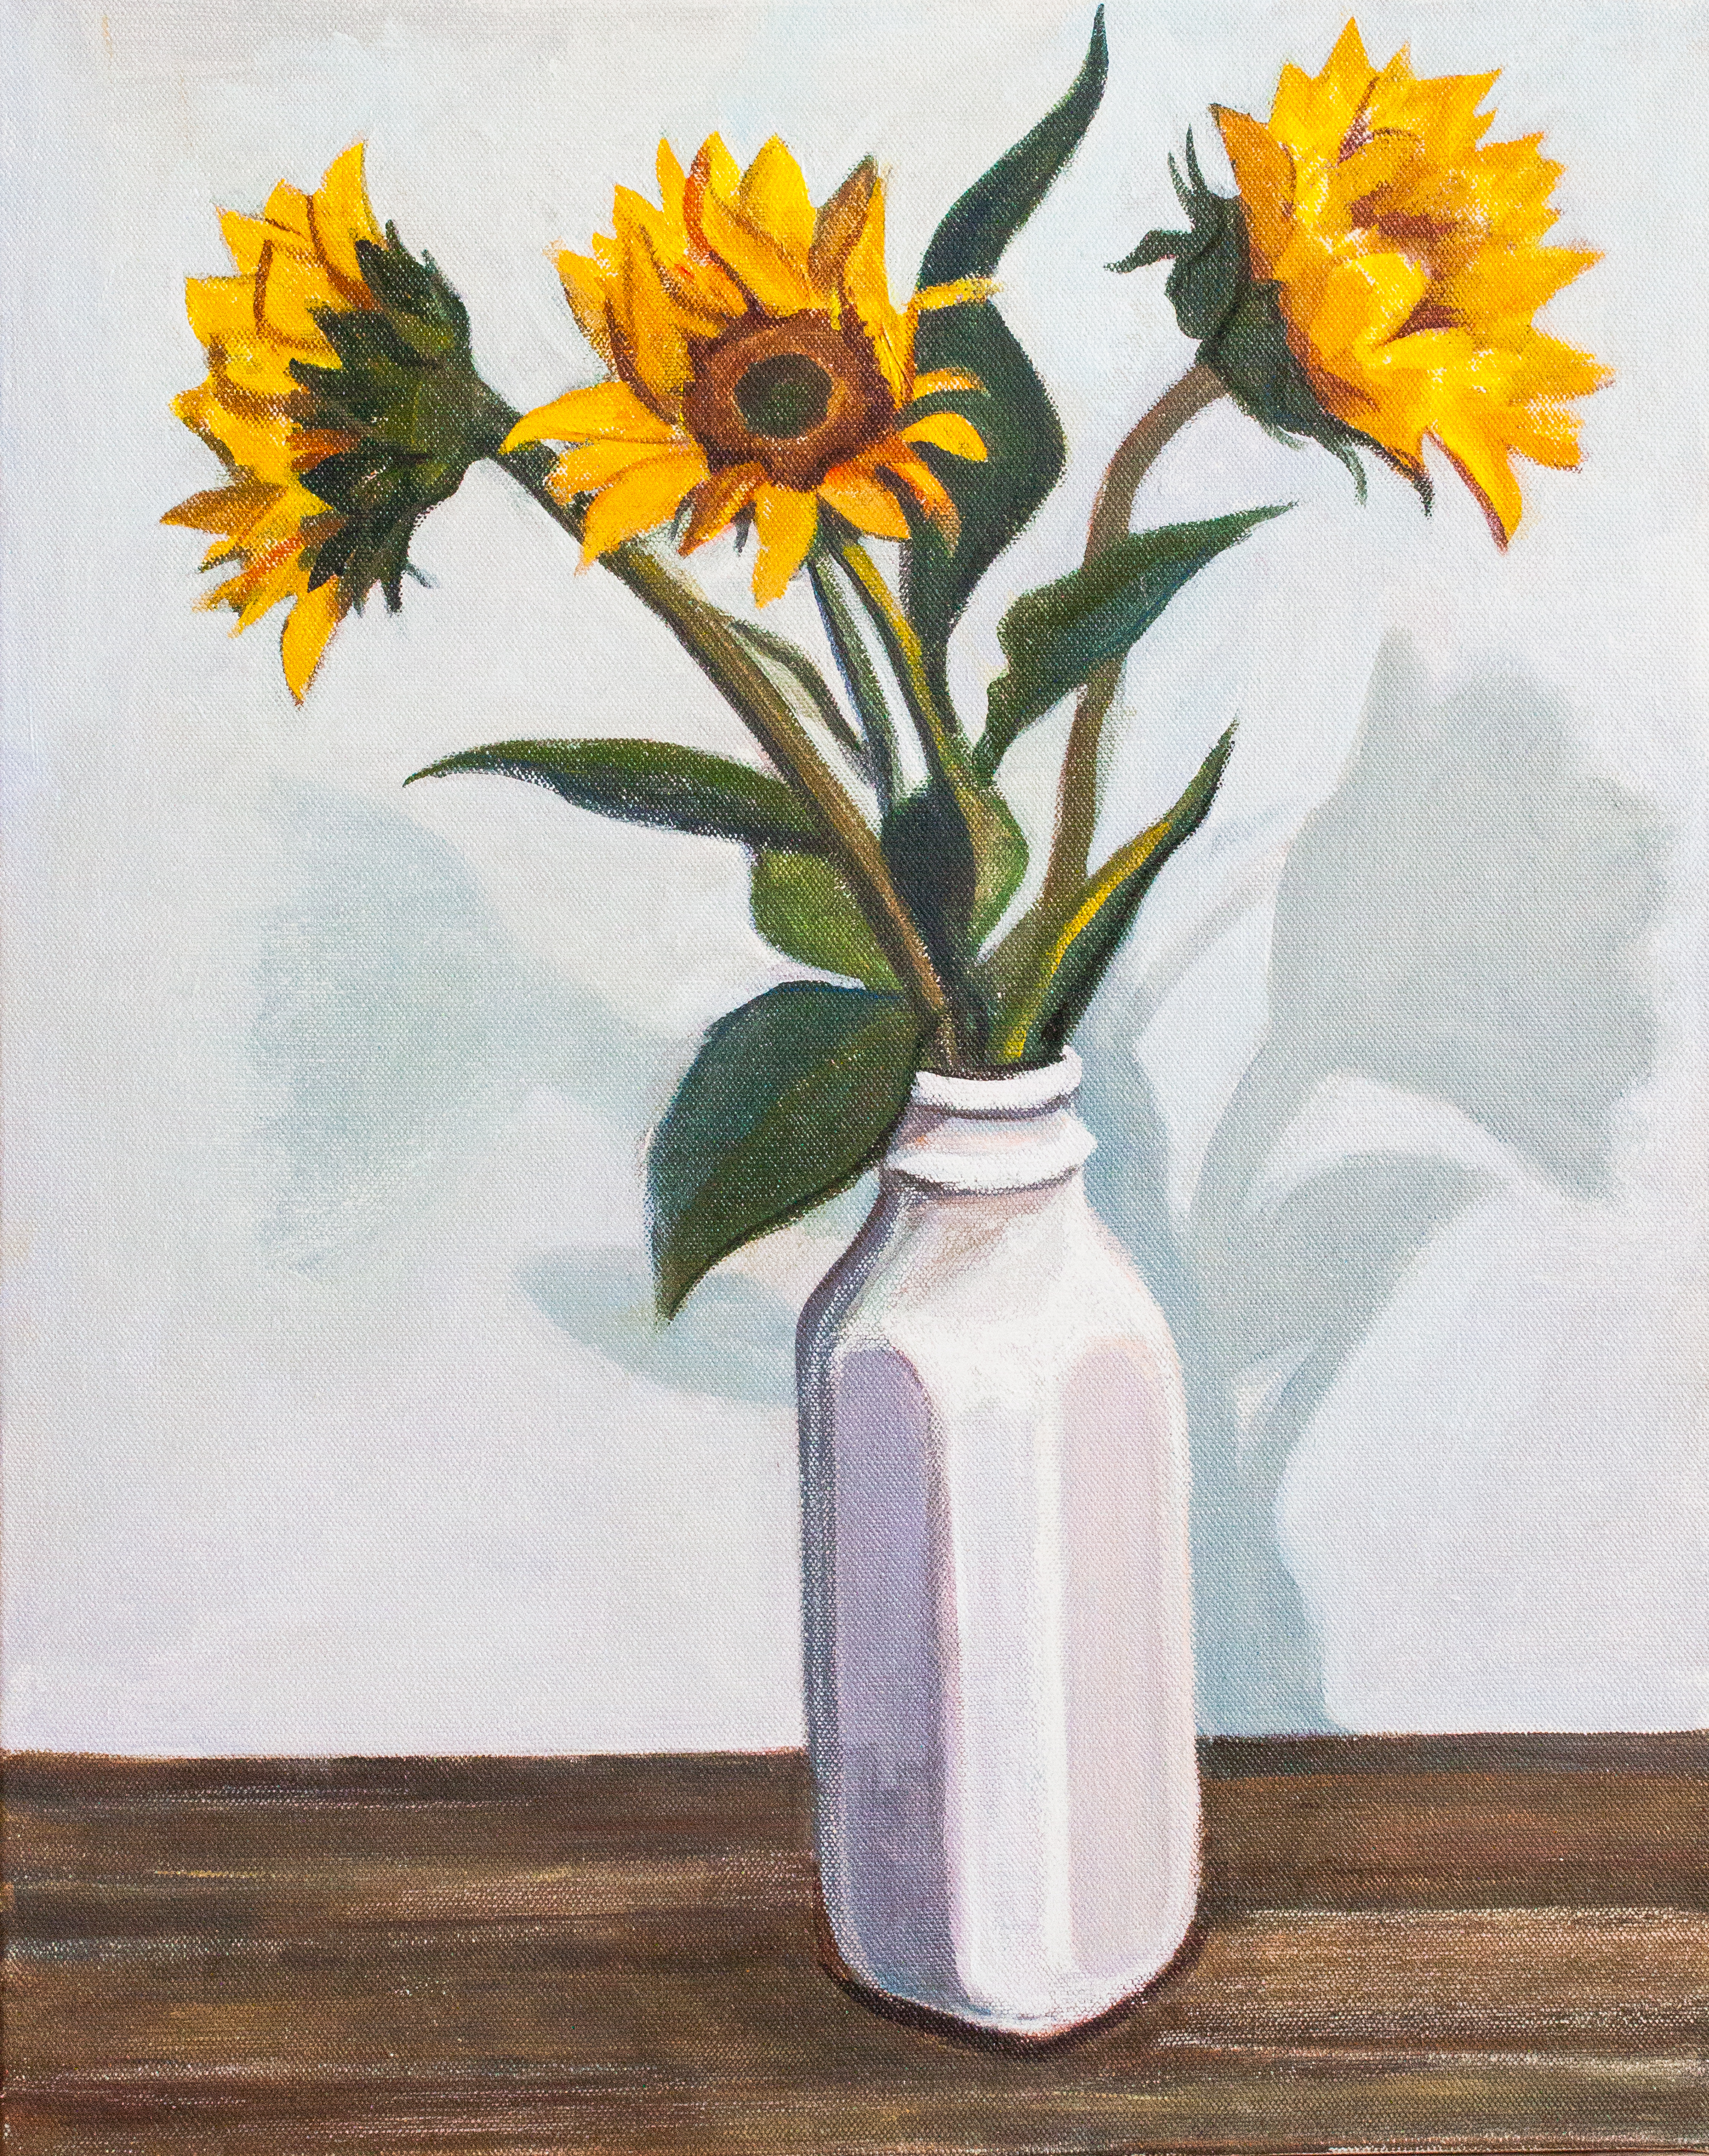 Three Sunflowers. Acrylic on Canvas. Allyson Kramer, 2015